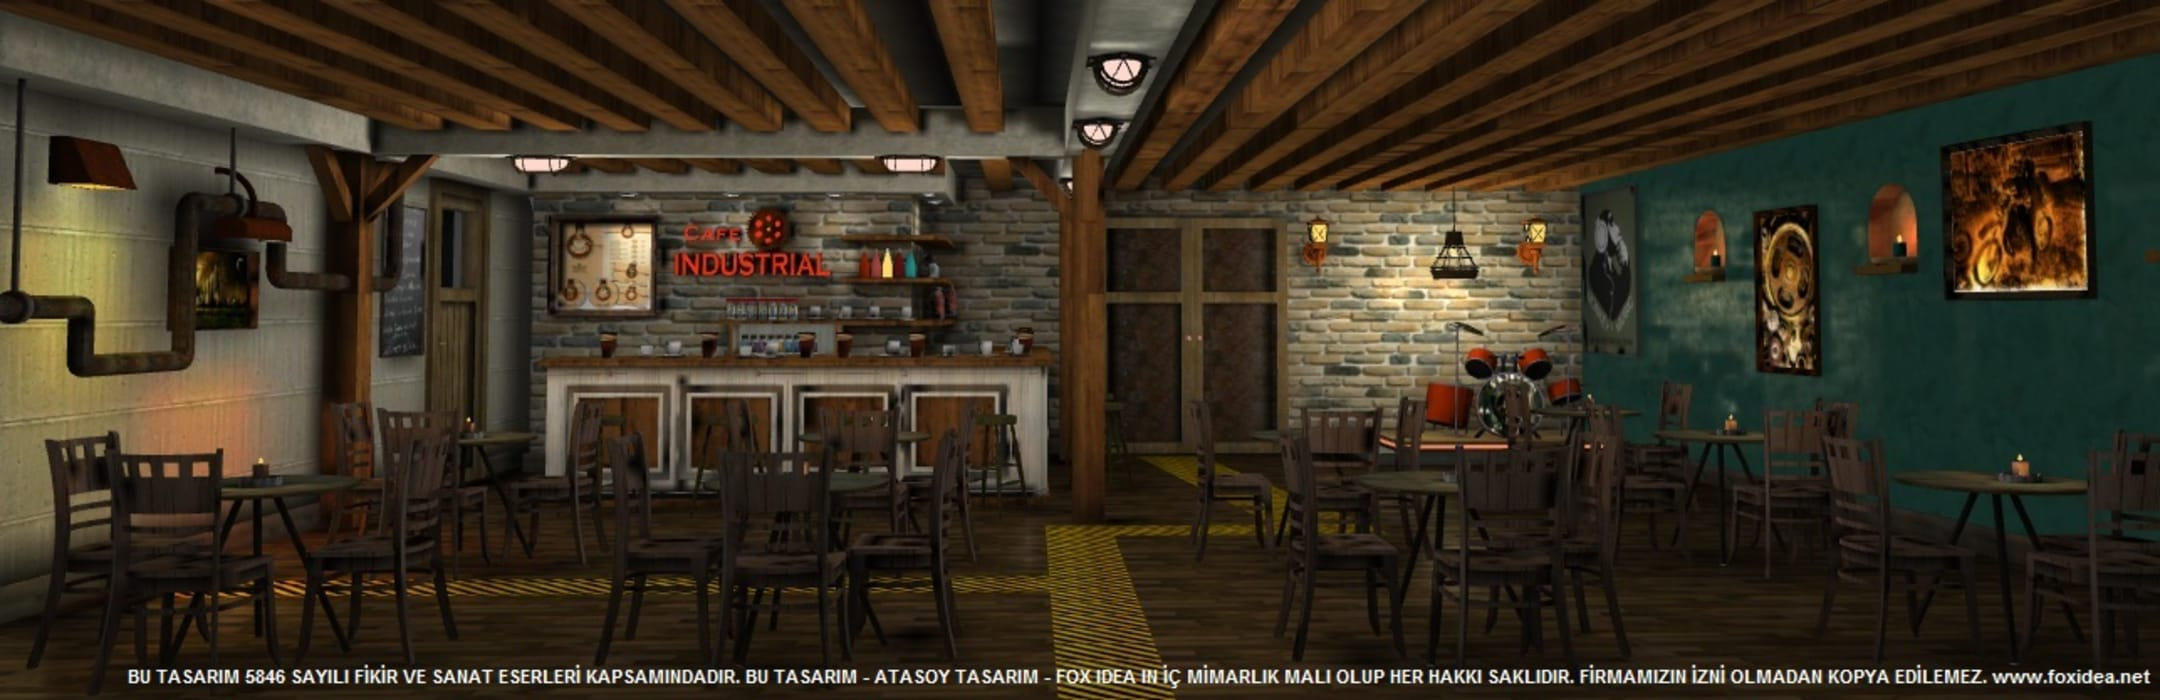 CAFE INDUSTRIAL Endüstriyel Duvar & Zemin FOX IDEA Endüstriyel